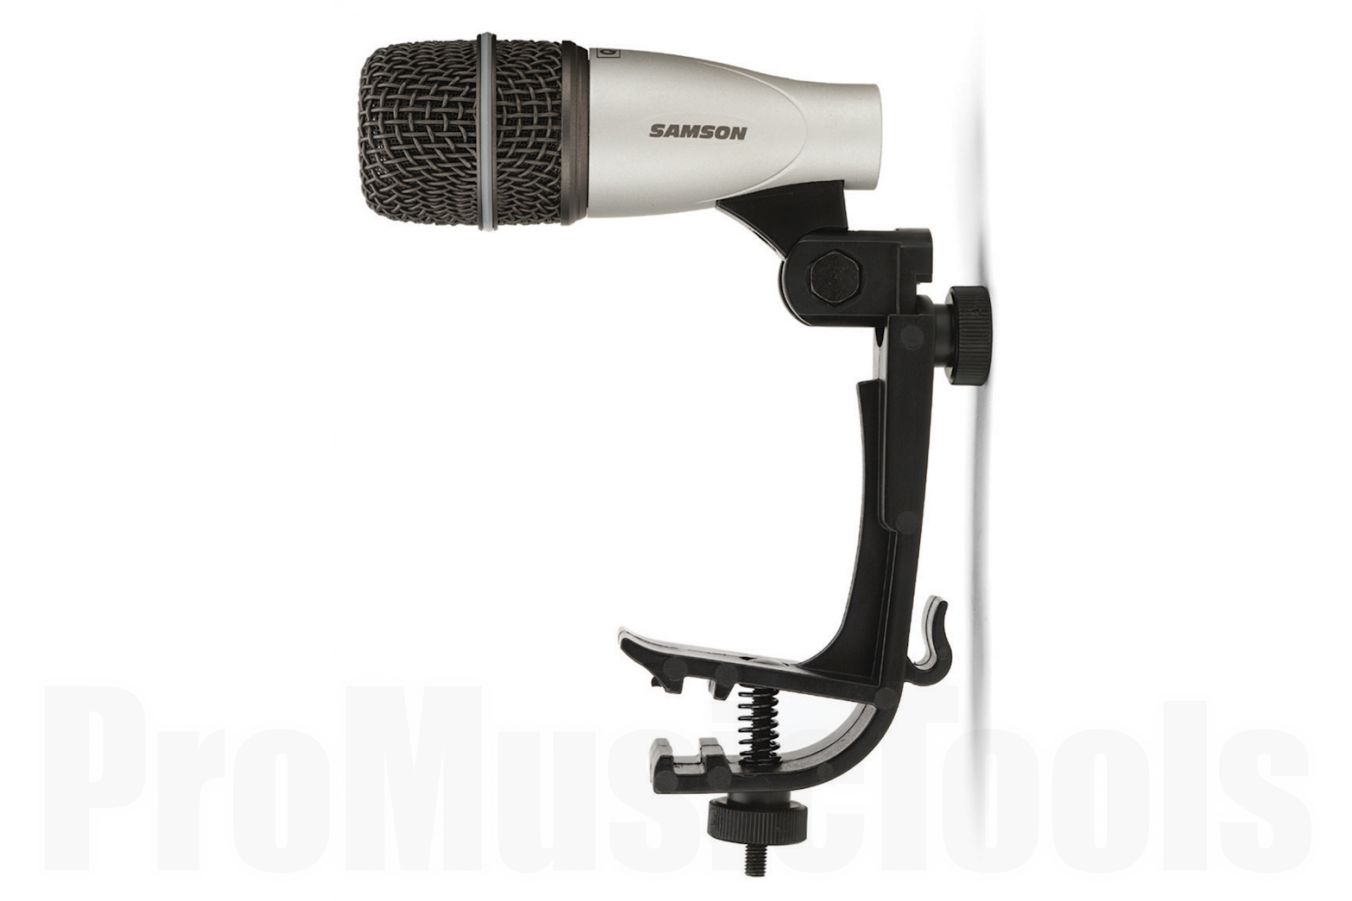 Samson Q Snare Drum Microphone